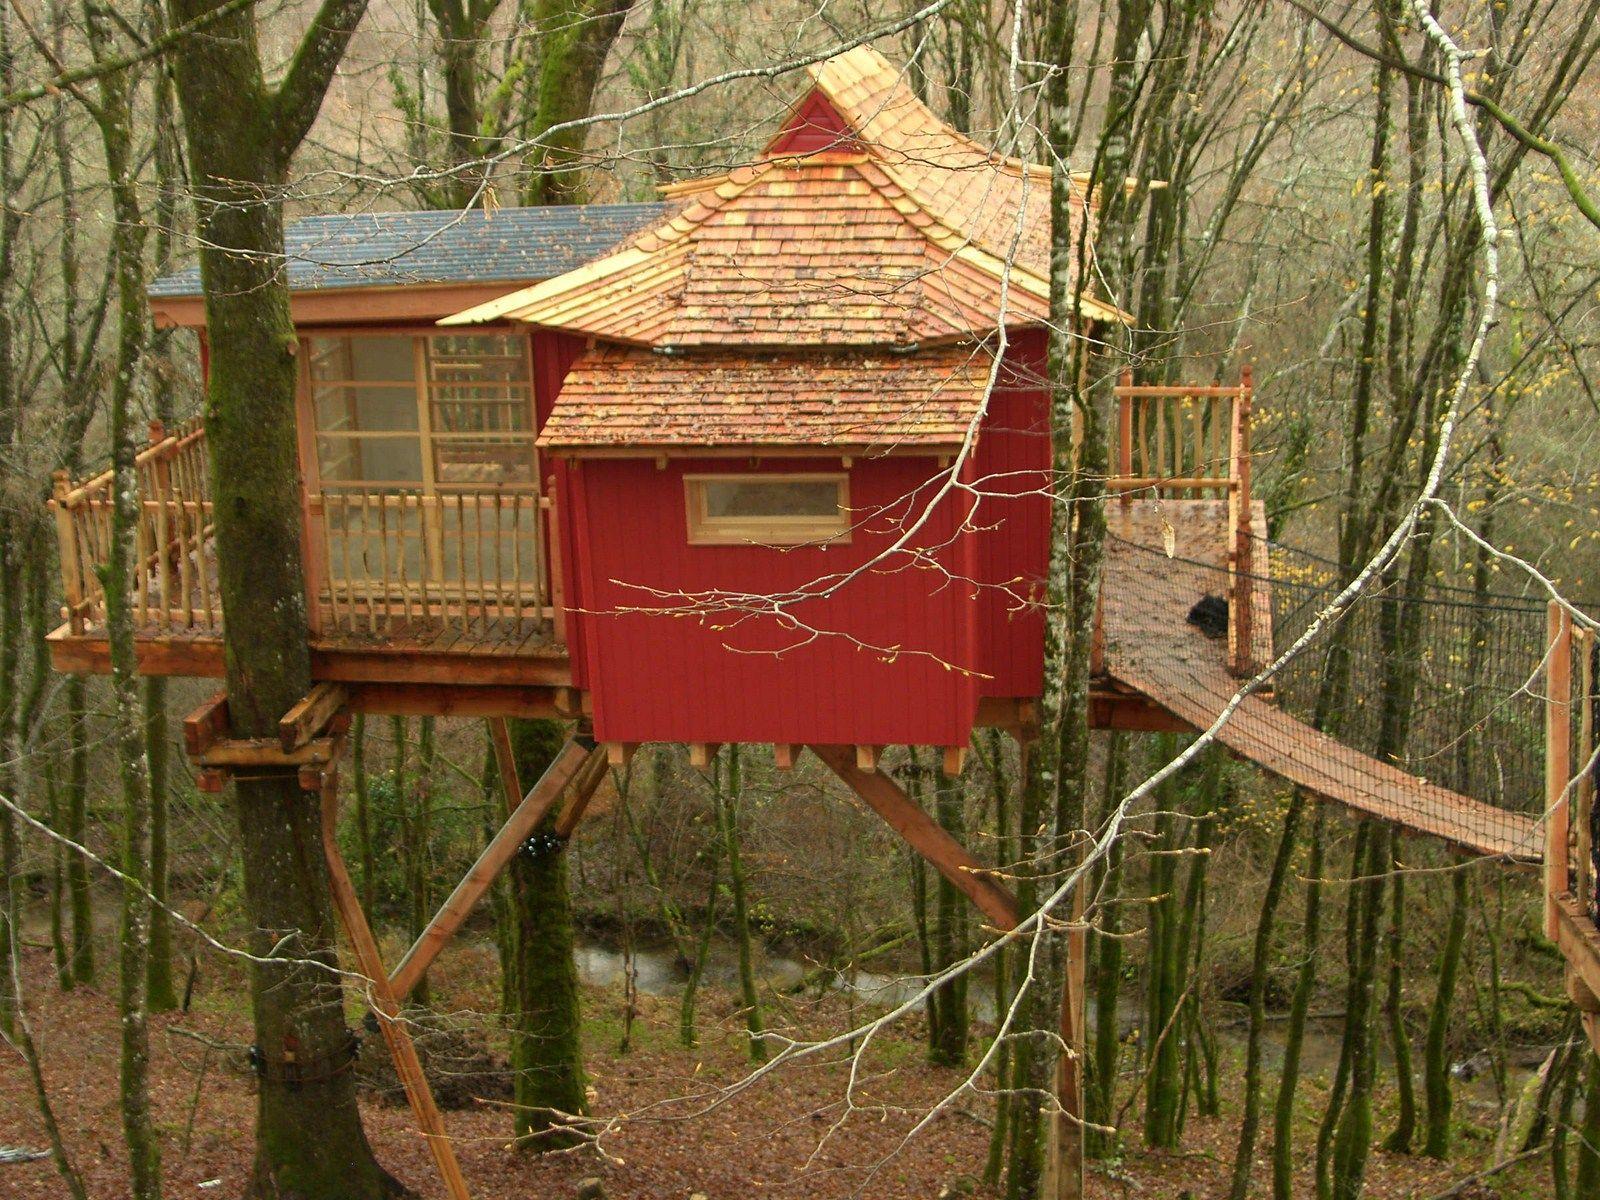 Home park design bilder tree house at les cabanes perchées périgord france  cabanes